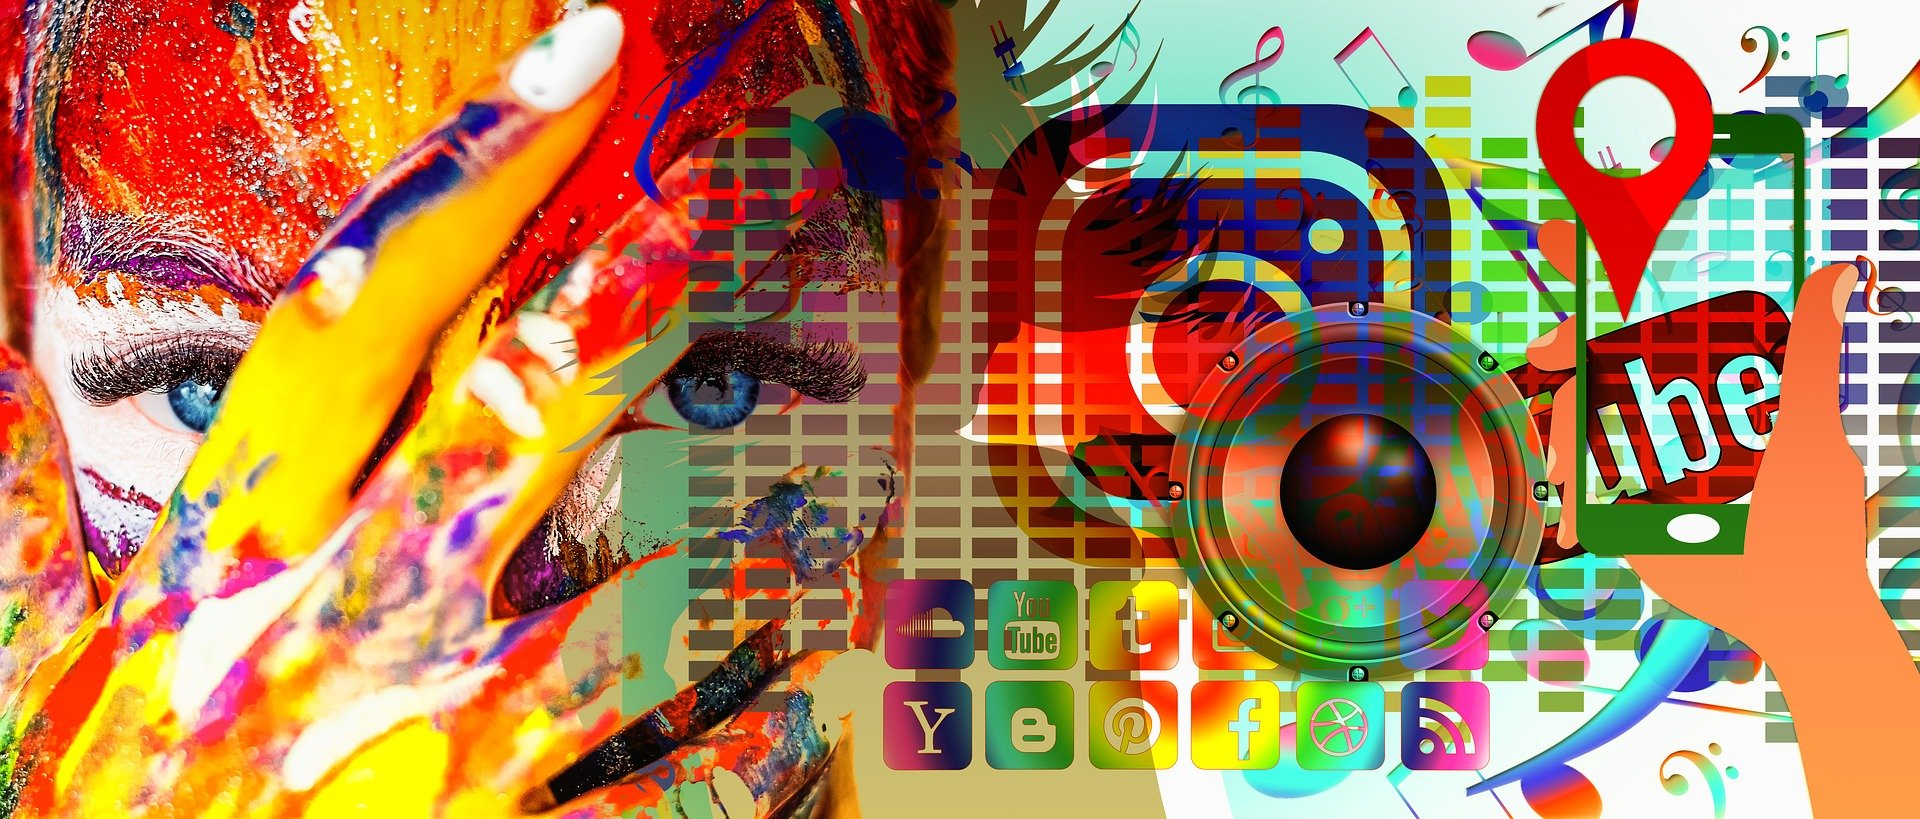 /UserFiles/File/Annuaire/annuaire_selections/soci/social-media-37583641920.jpg